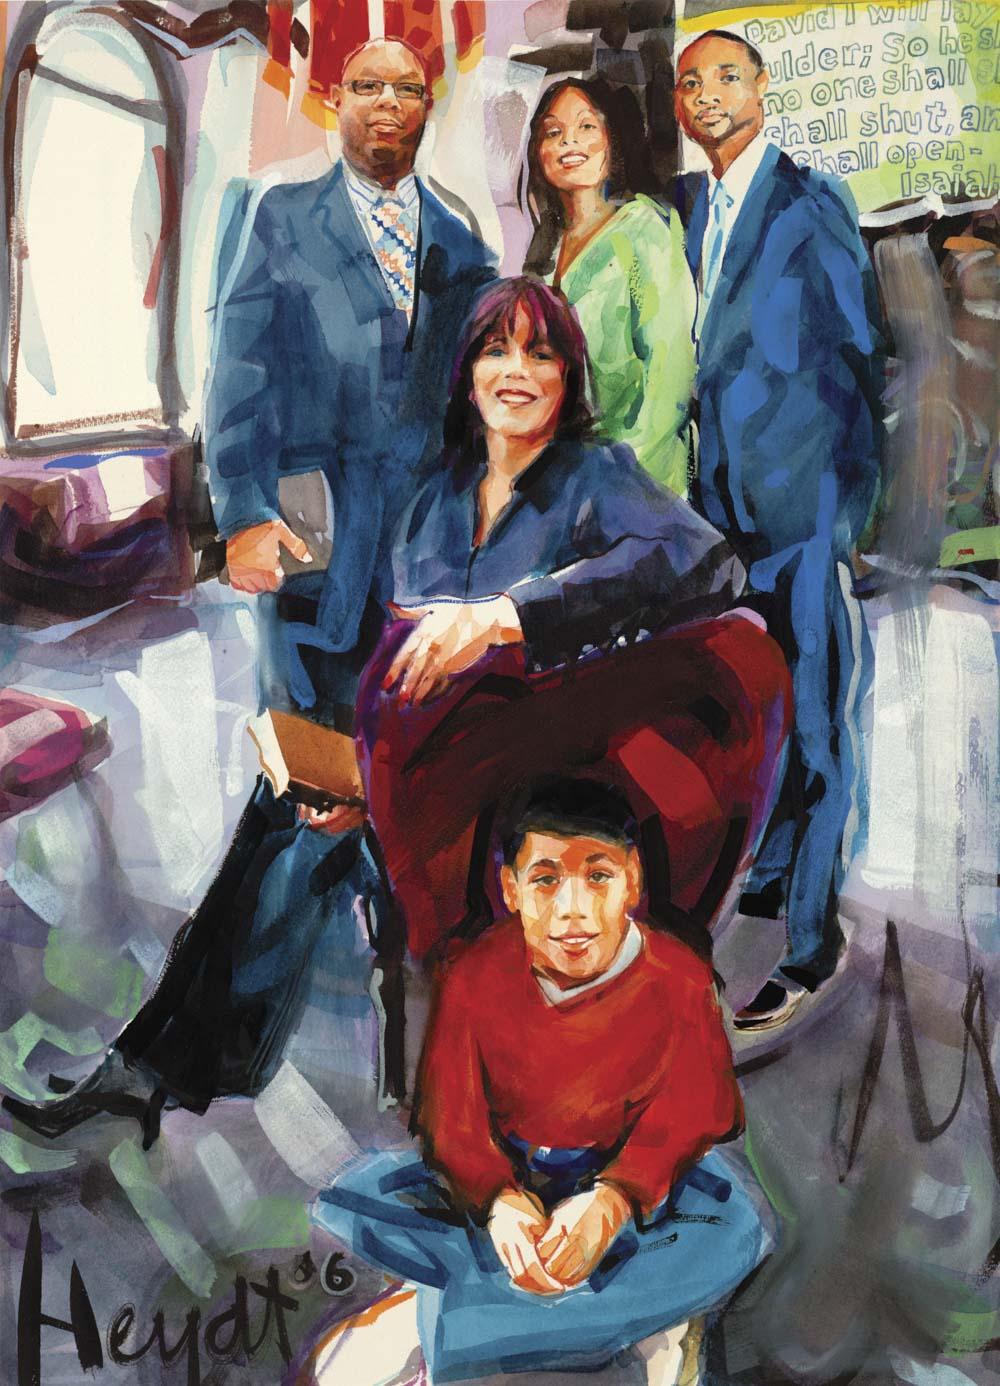 Pastors Steve & Mary Robinson with family